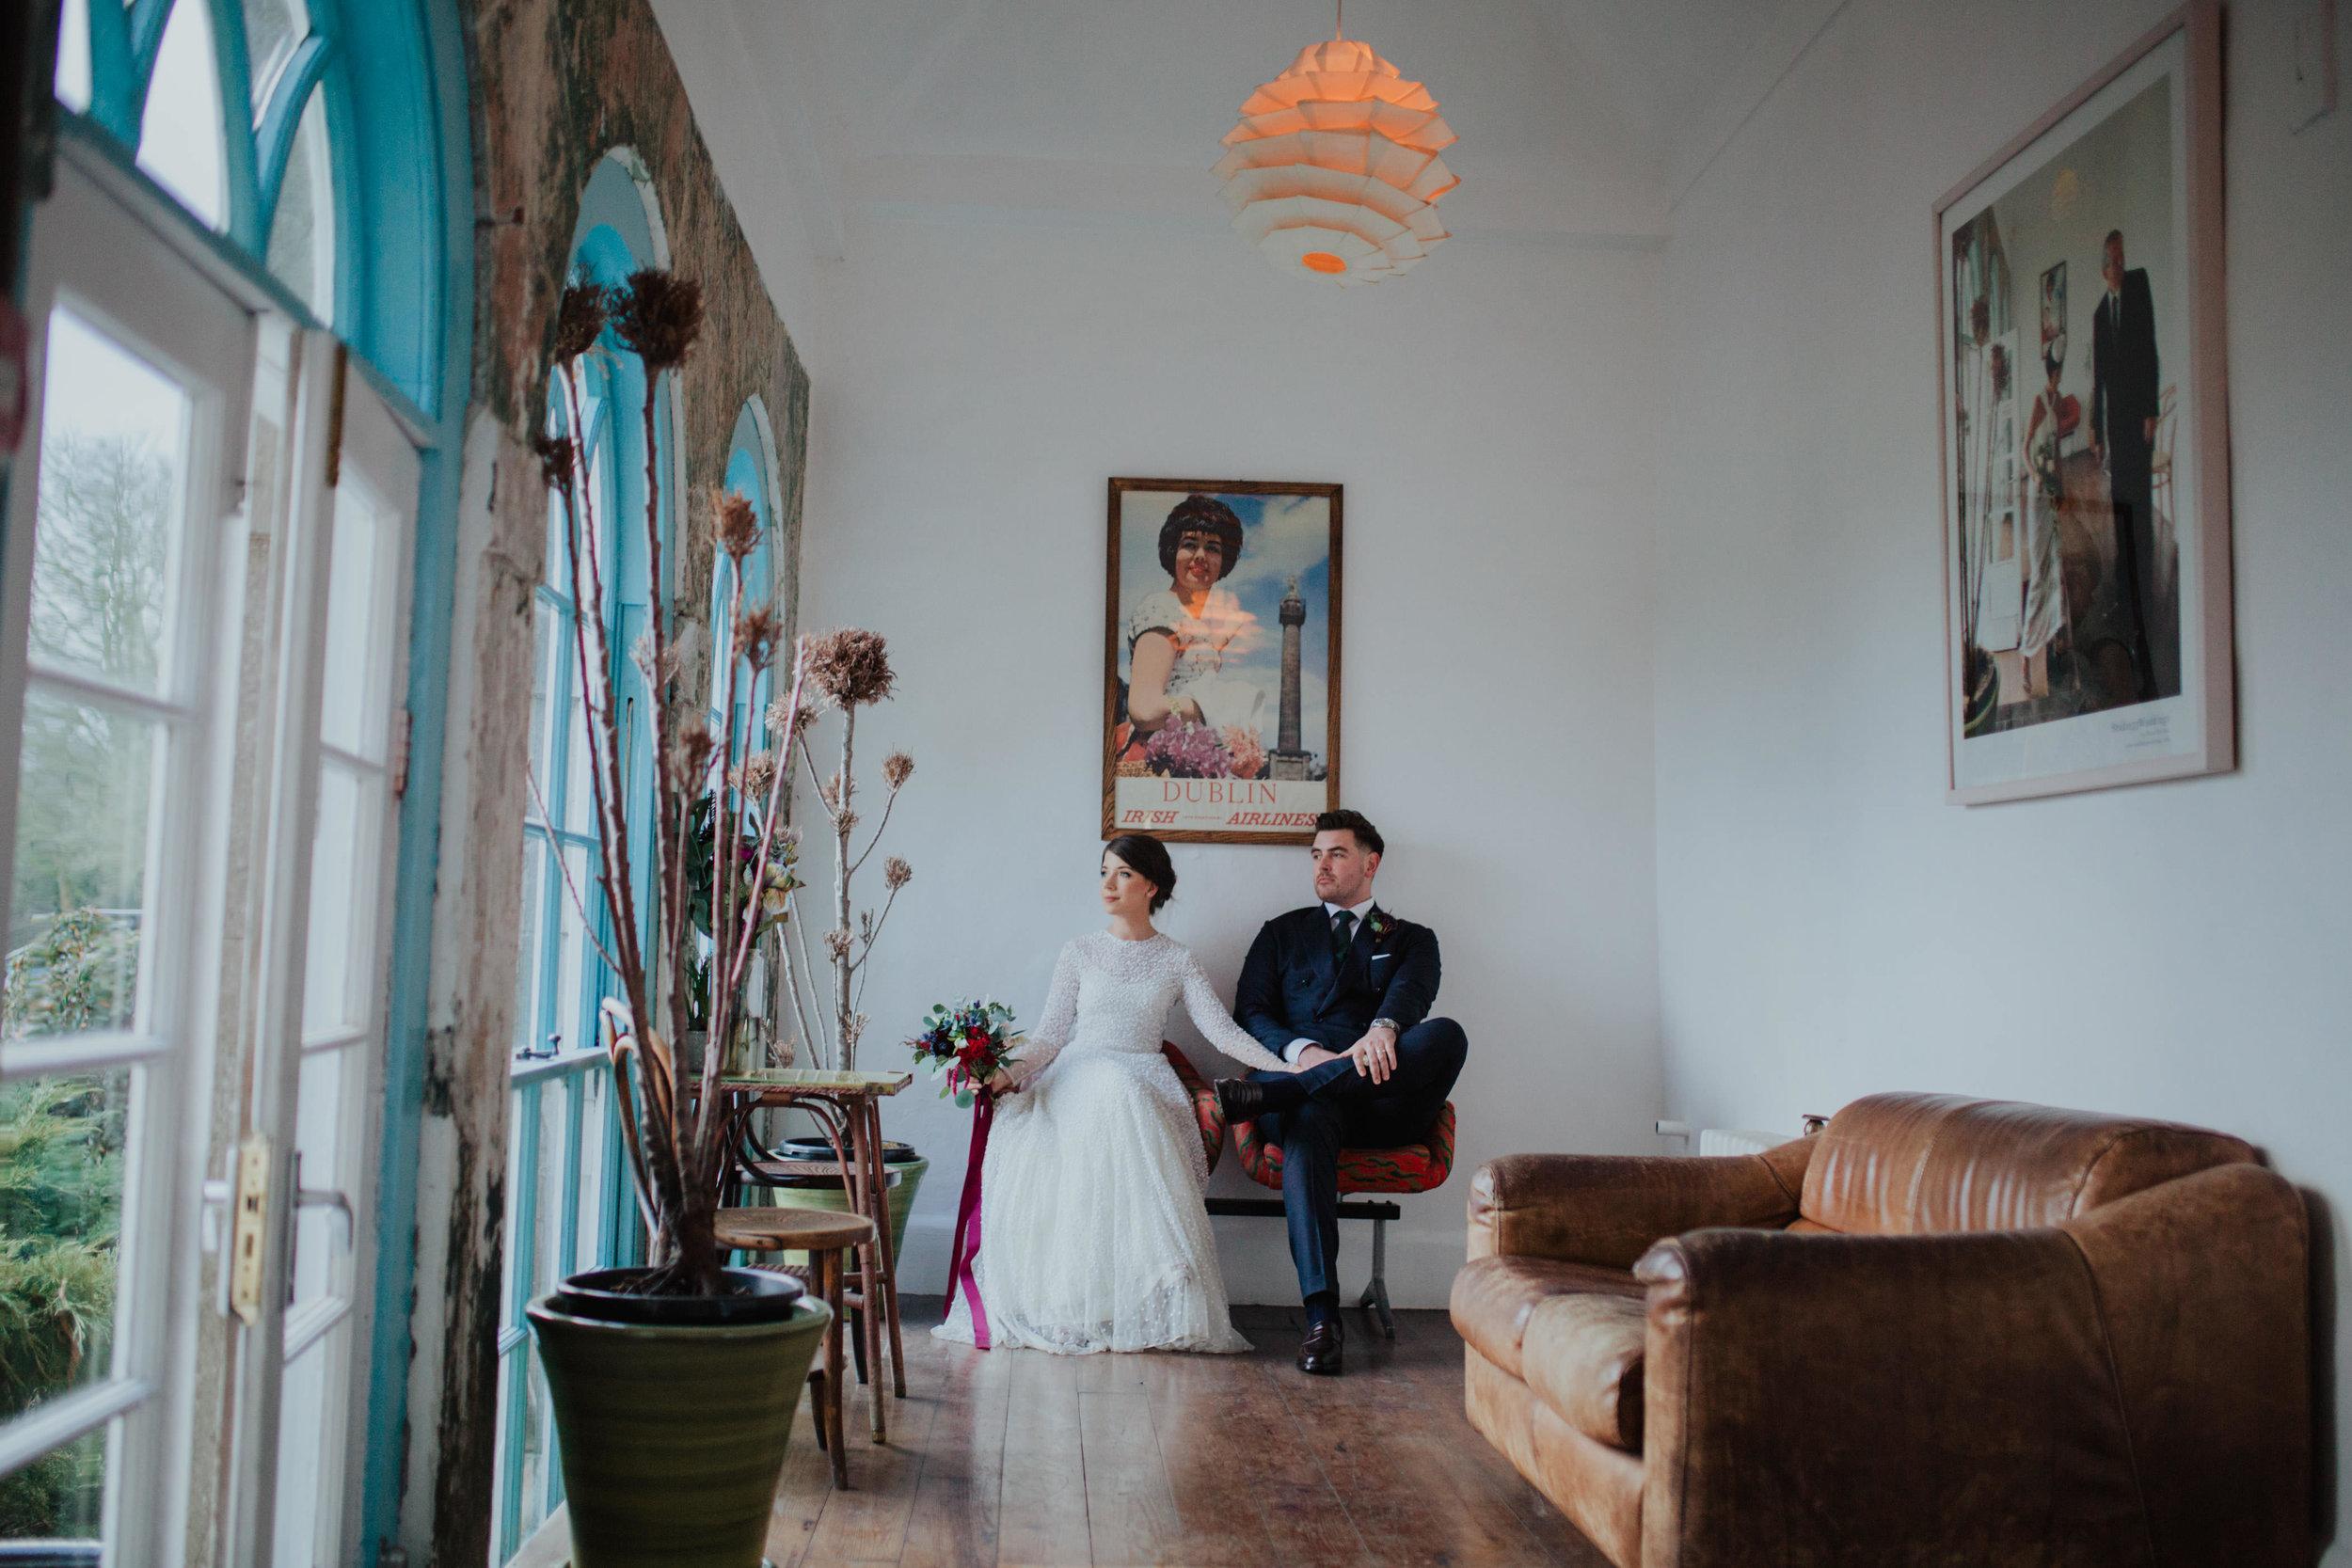 s+e_bellinter_house_wedding_photographer_livia_figueiredo745.jpg